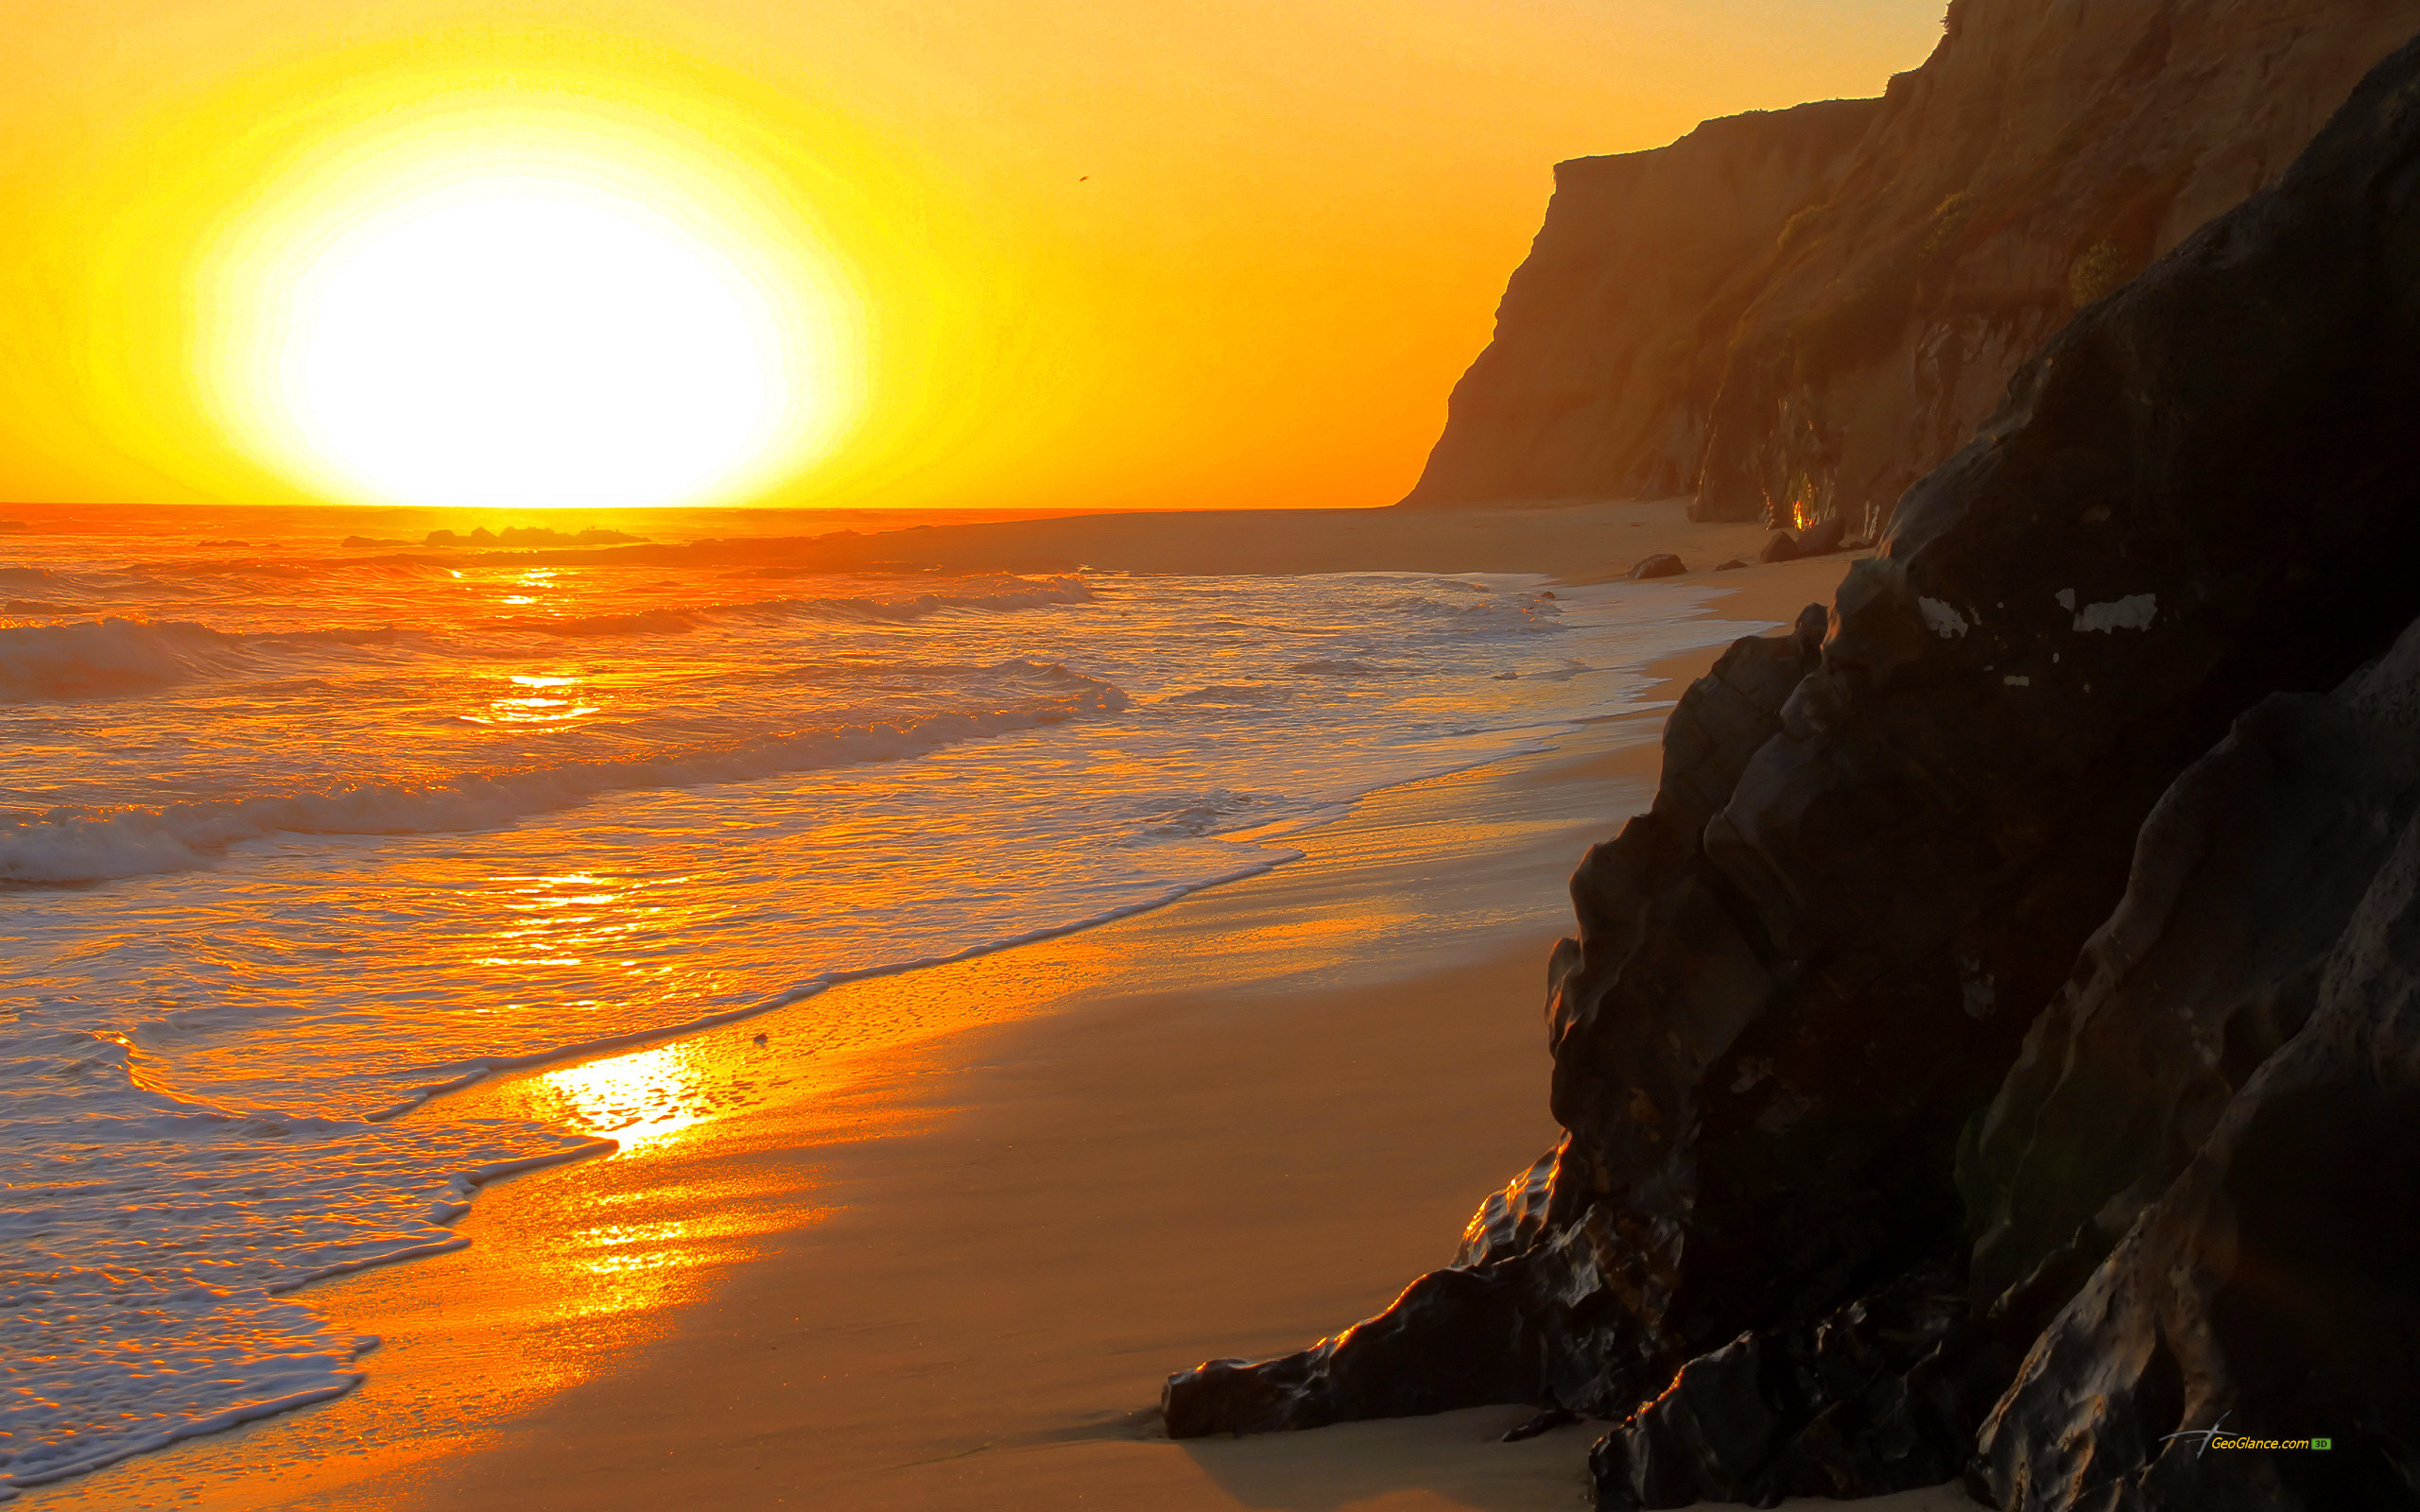 Sunset Wallpapers Coastal - HD Desktop Wallpapers